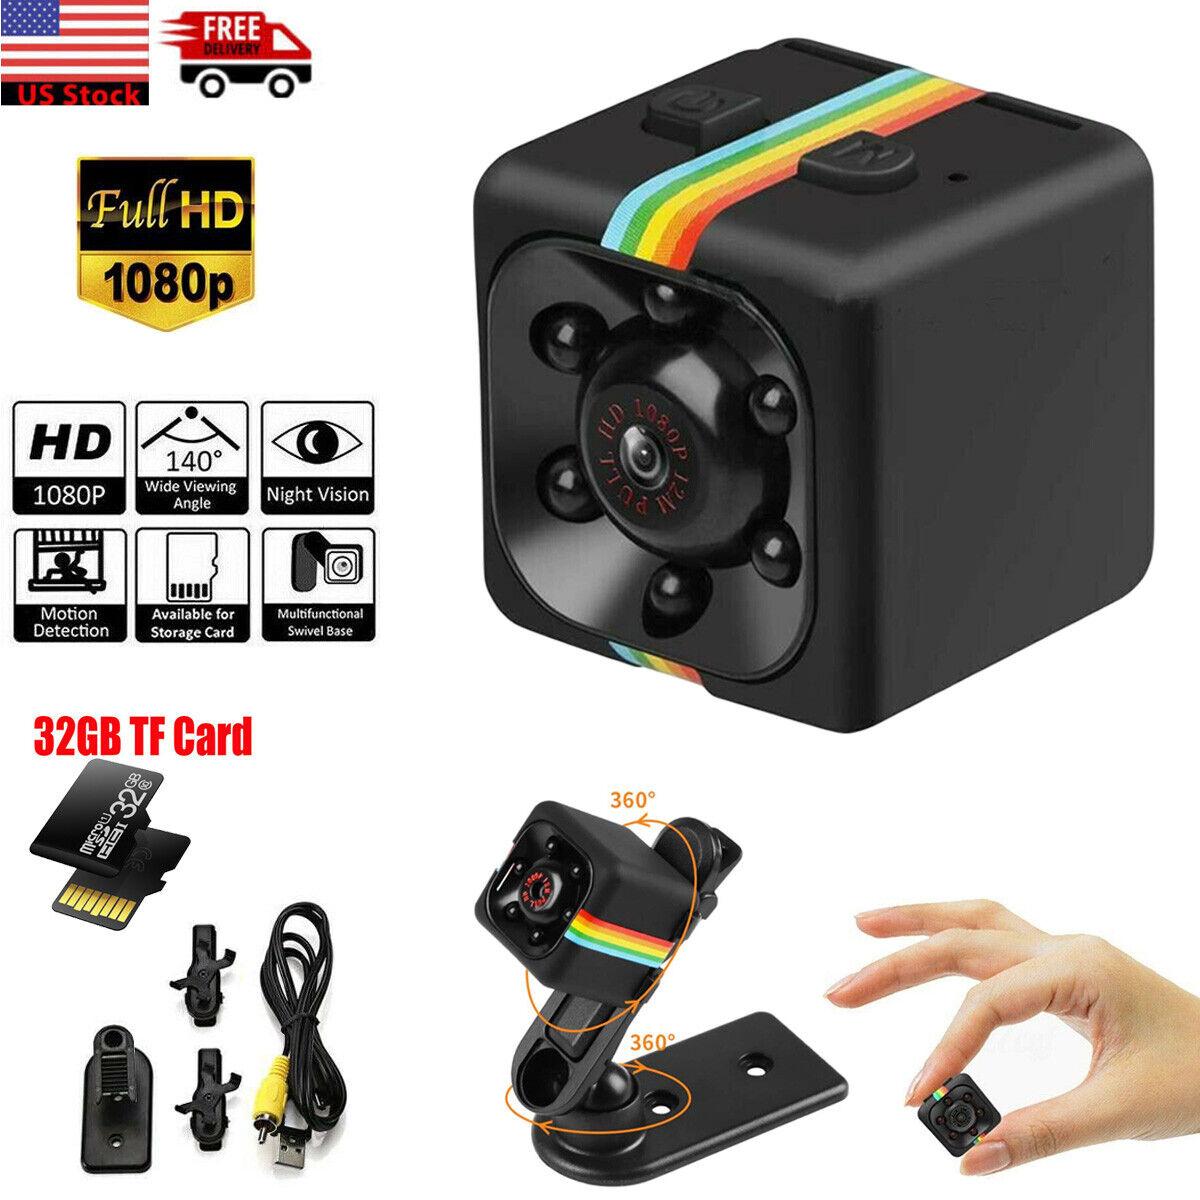 SQ11 Cop Spy Nanny Camera Wireless Hidden Motion DV HD 1080P